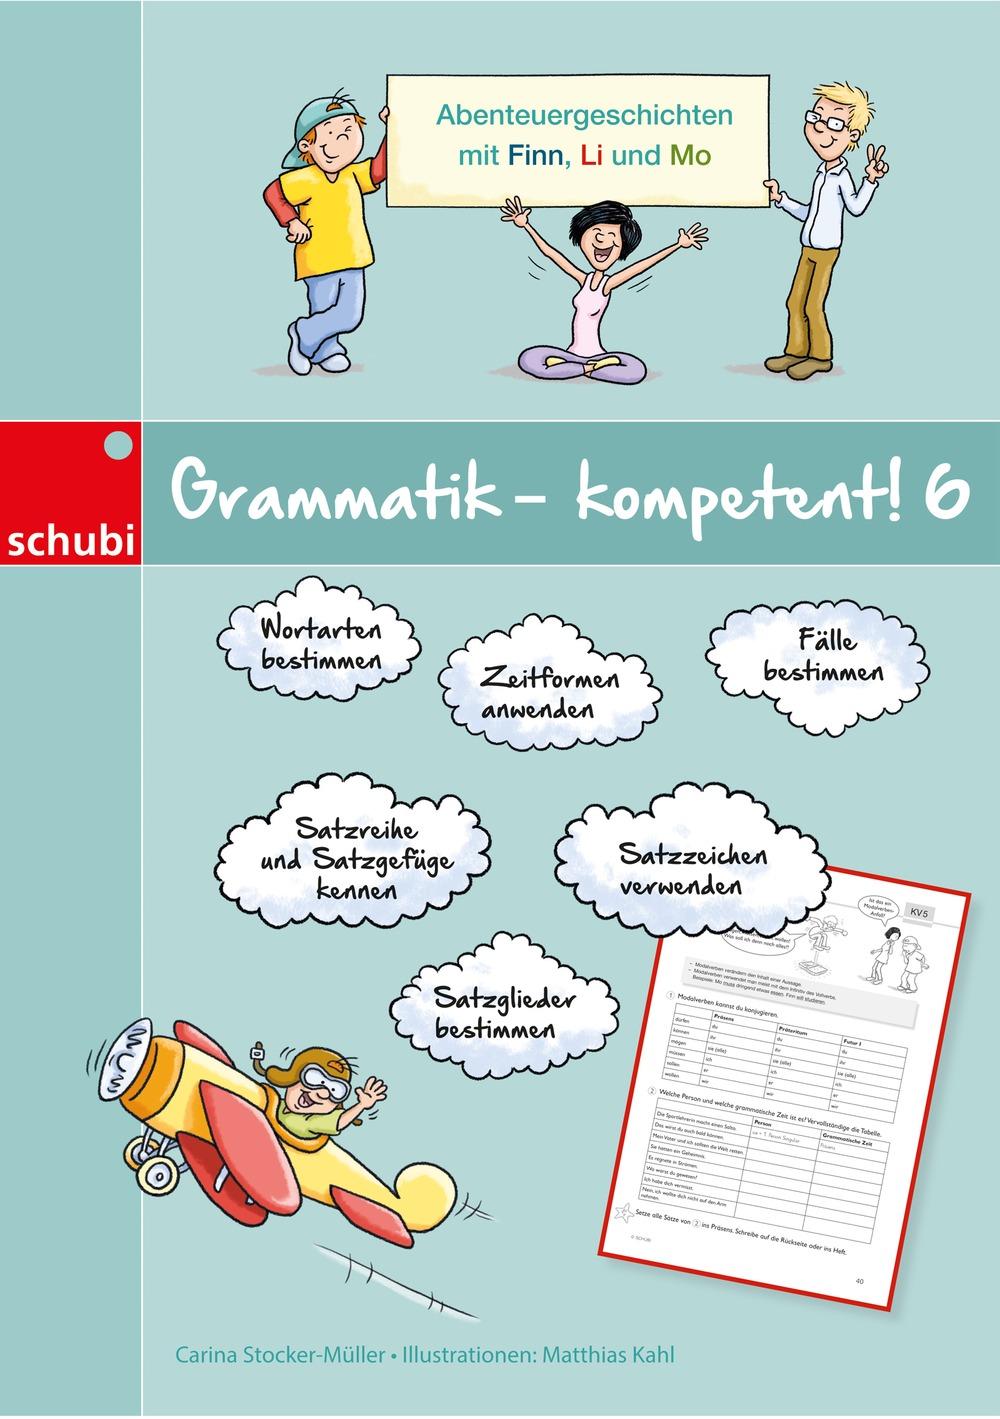 Grammatik Kompetent 6 Schubi